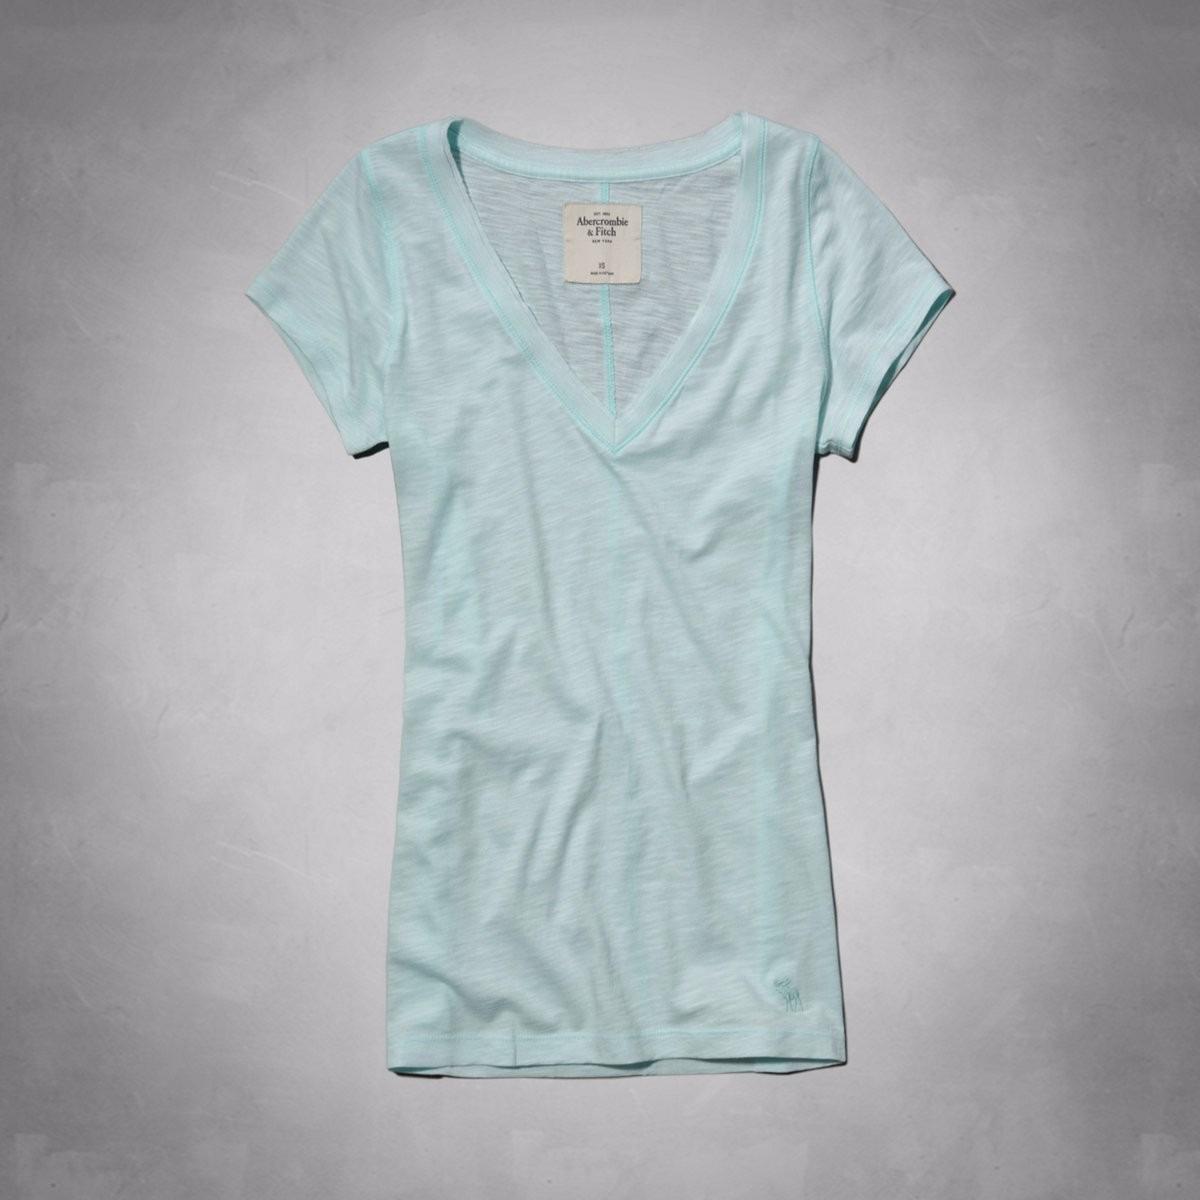 ddc6528dbb camiseta abercrombie feminina casacos polos tommy hollister. Carregando zoom .